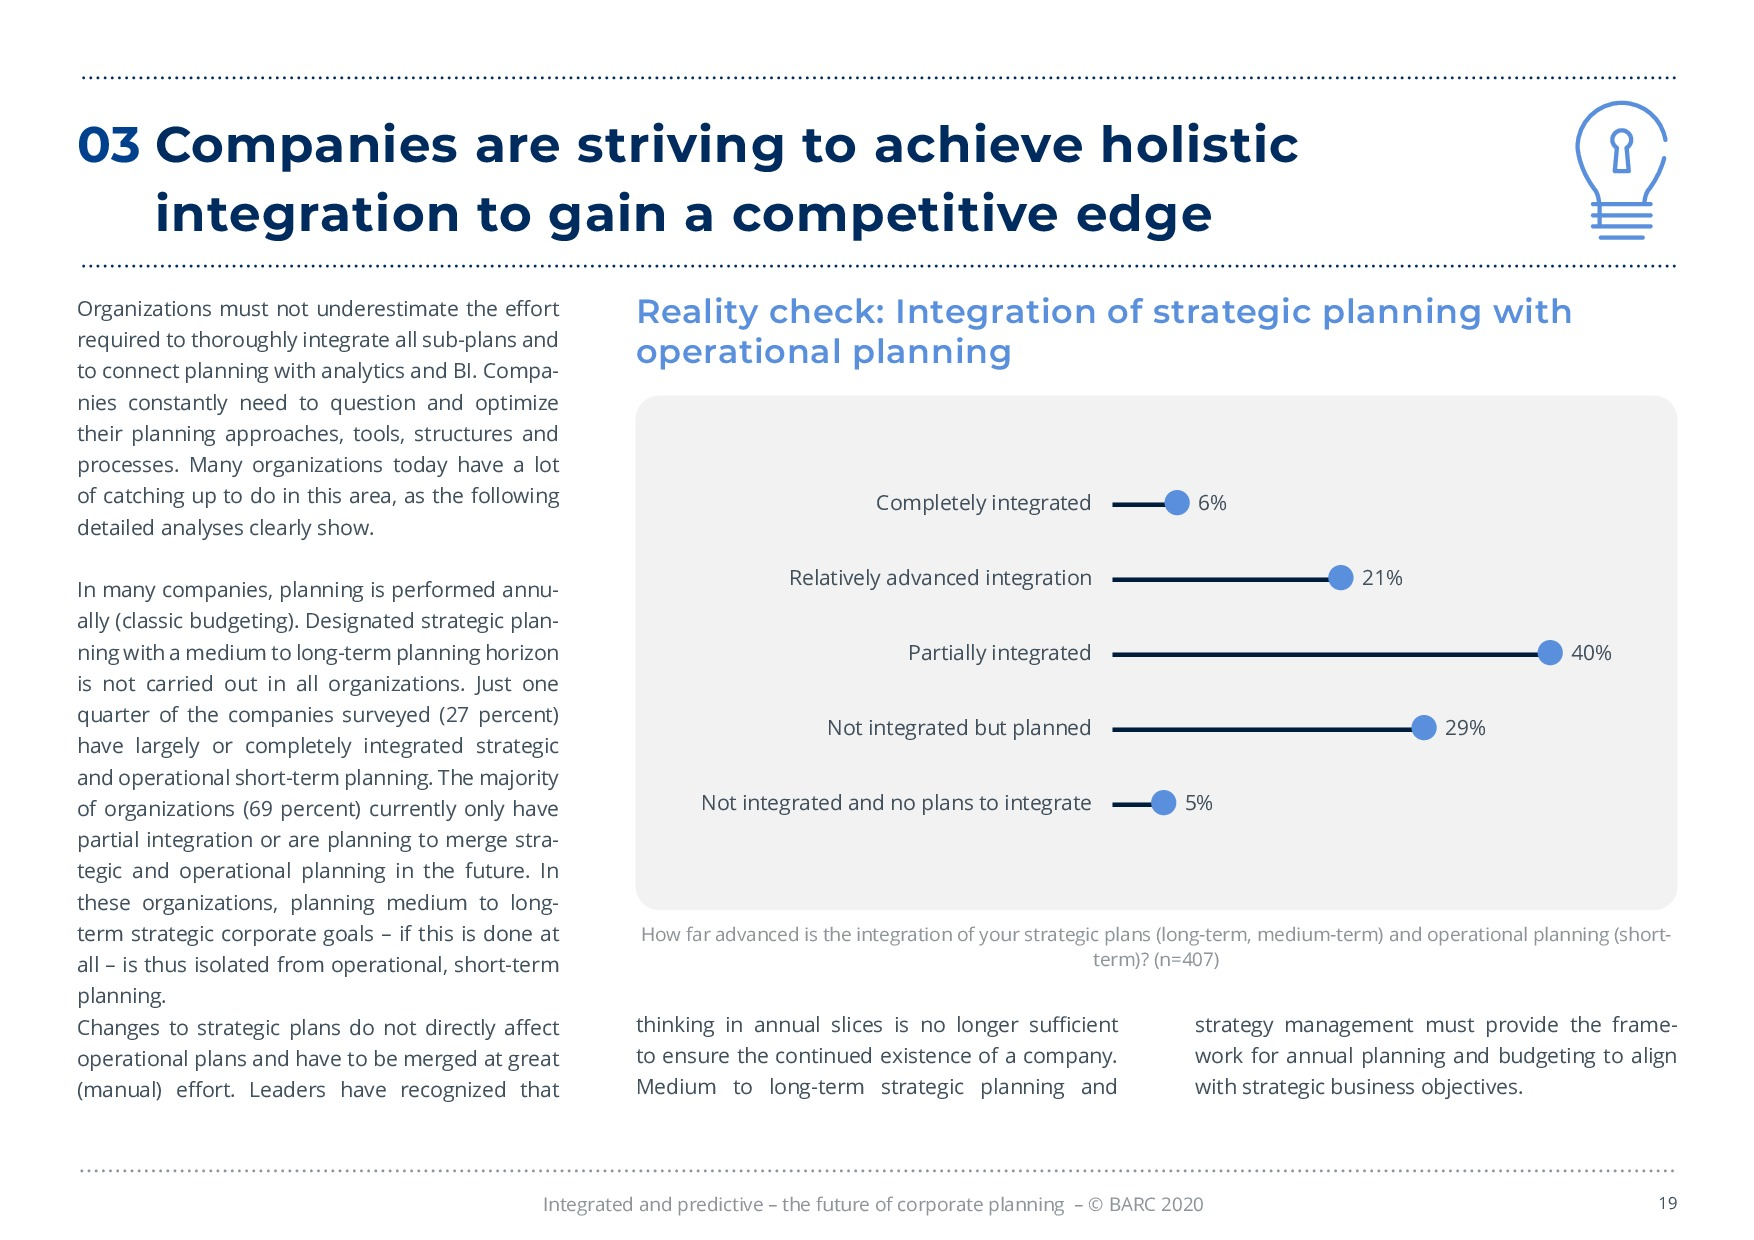 BARC – 統合と予測 – 経営計画の未来 | Page 19